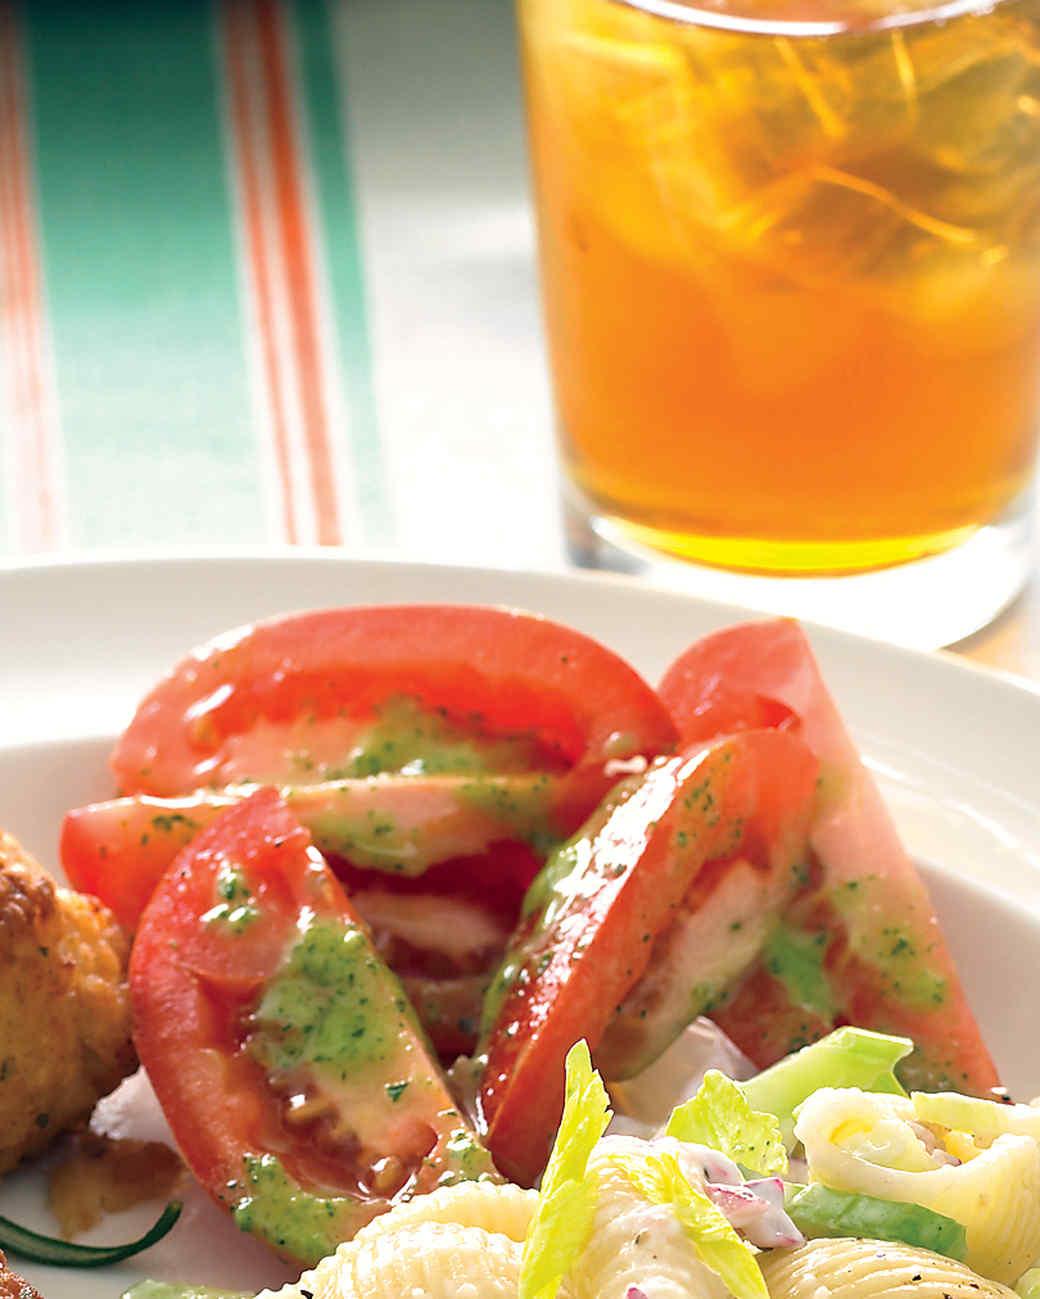 Tomato Salad with Parsley Vinaigrette